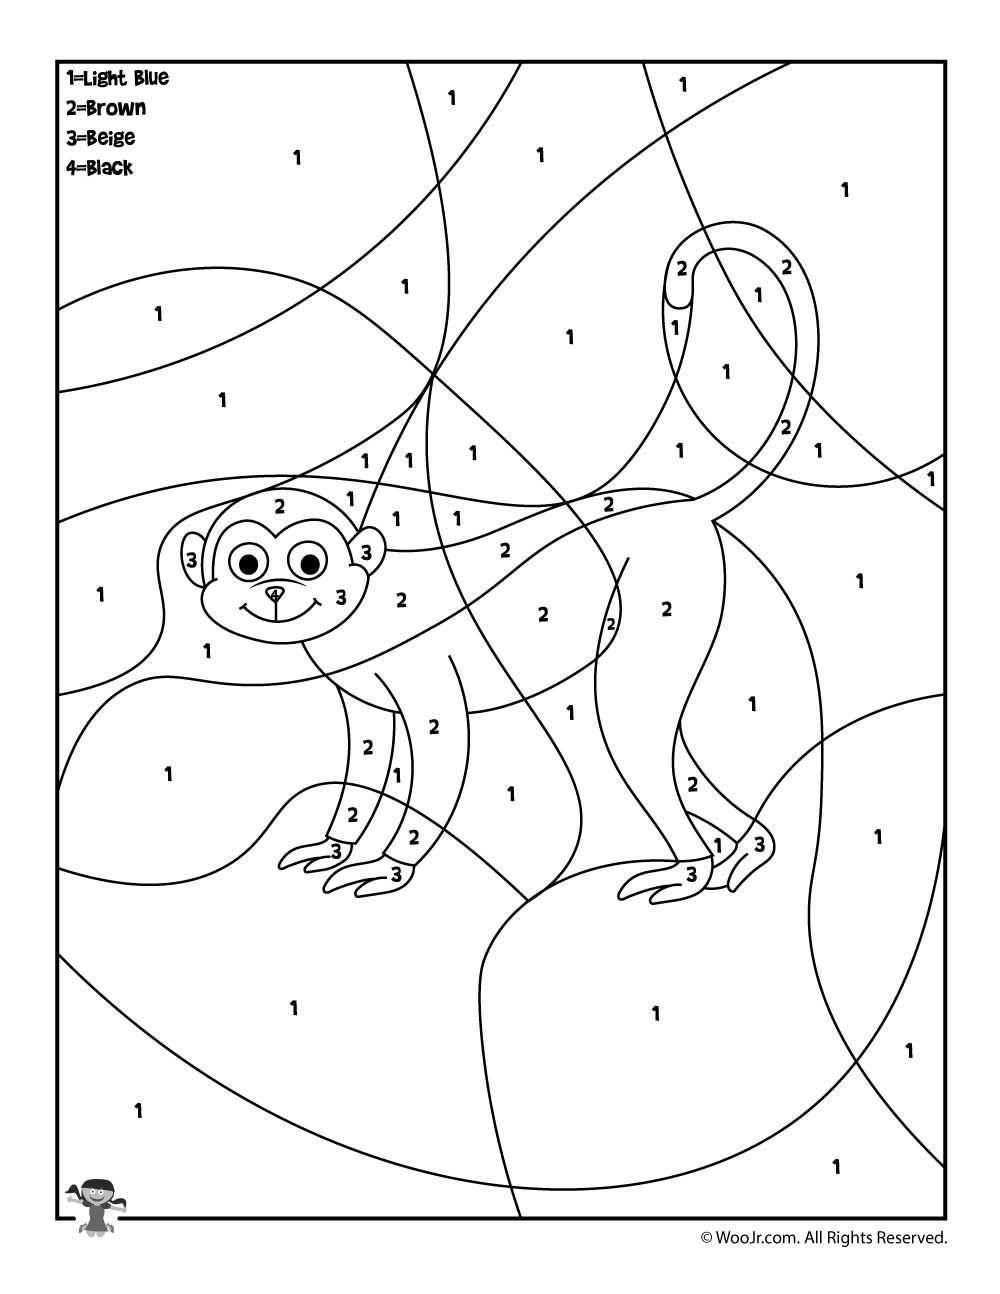 Preschool Color By Number Animal Coloring Pages Woo Jr Kids Activities Animal Coloring Pages Coloring Pages Preschool Colors